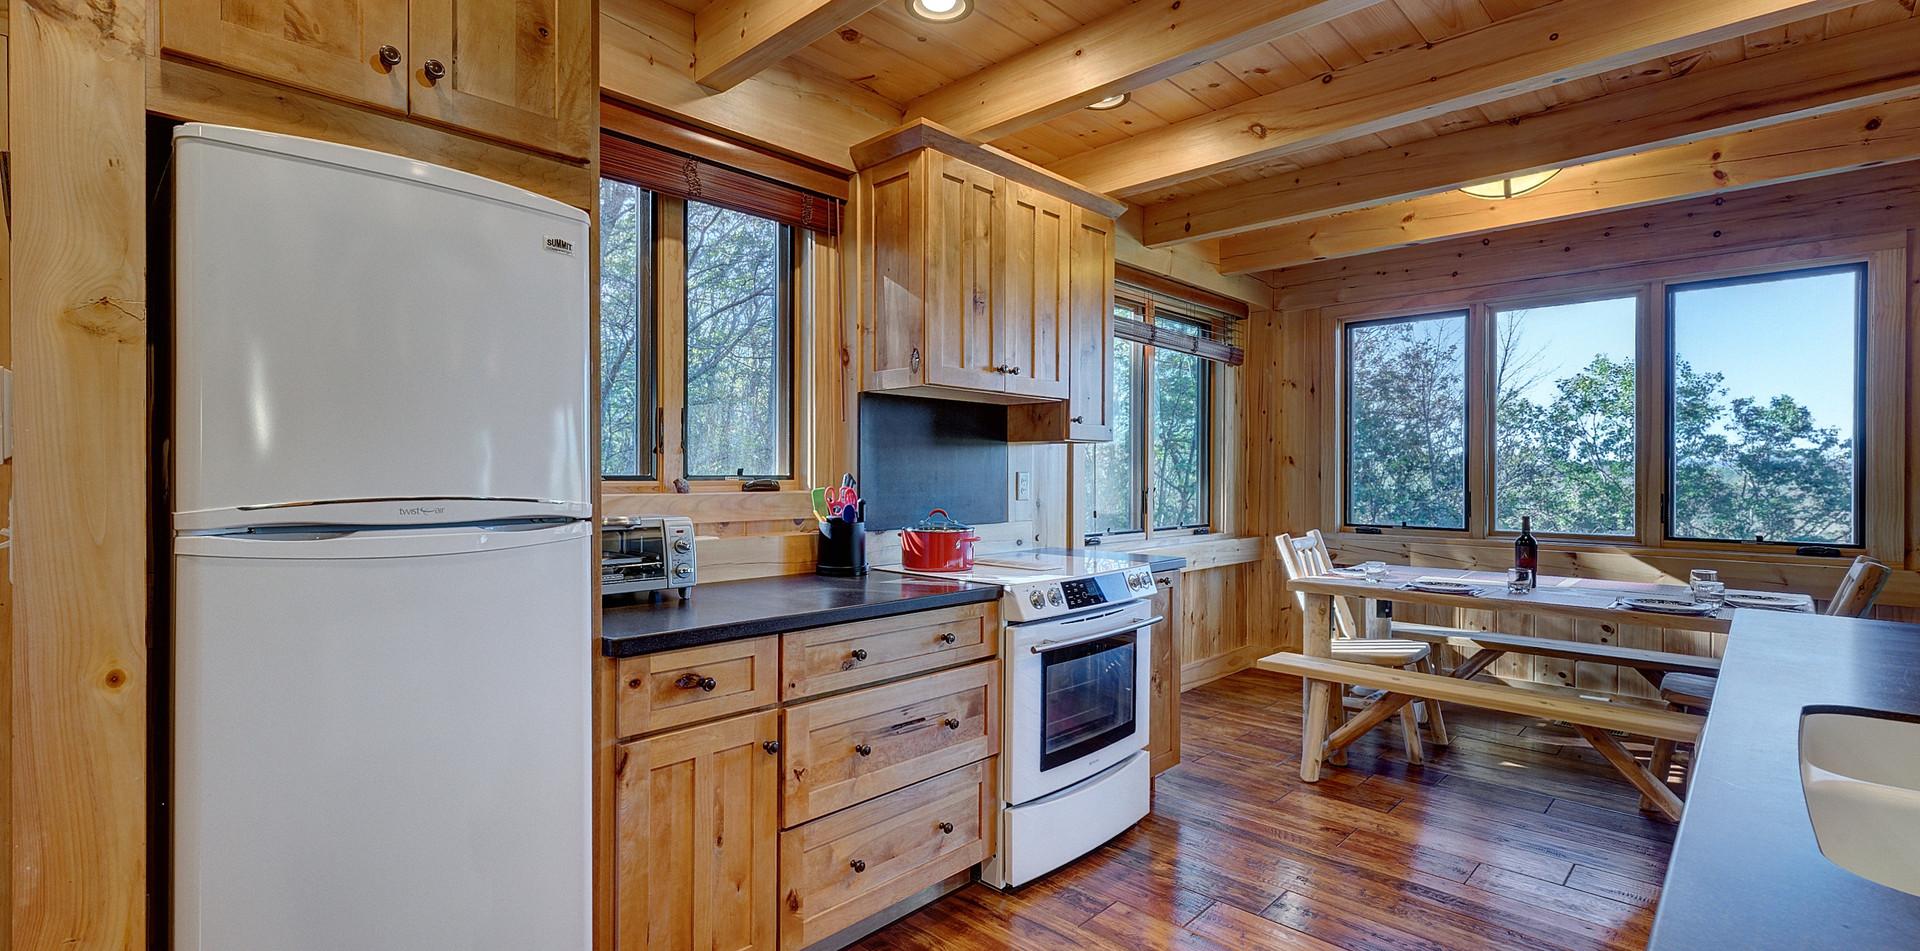 Even the kitchen boasts amazing mountain views.